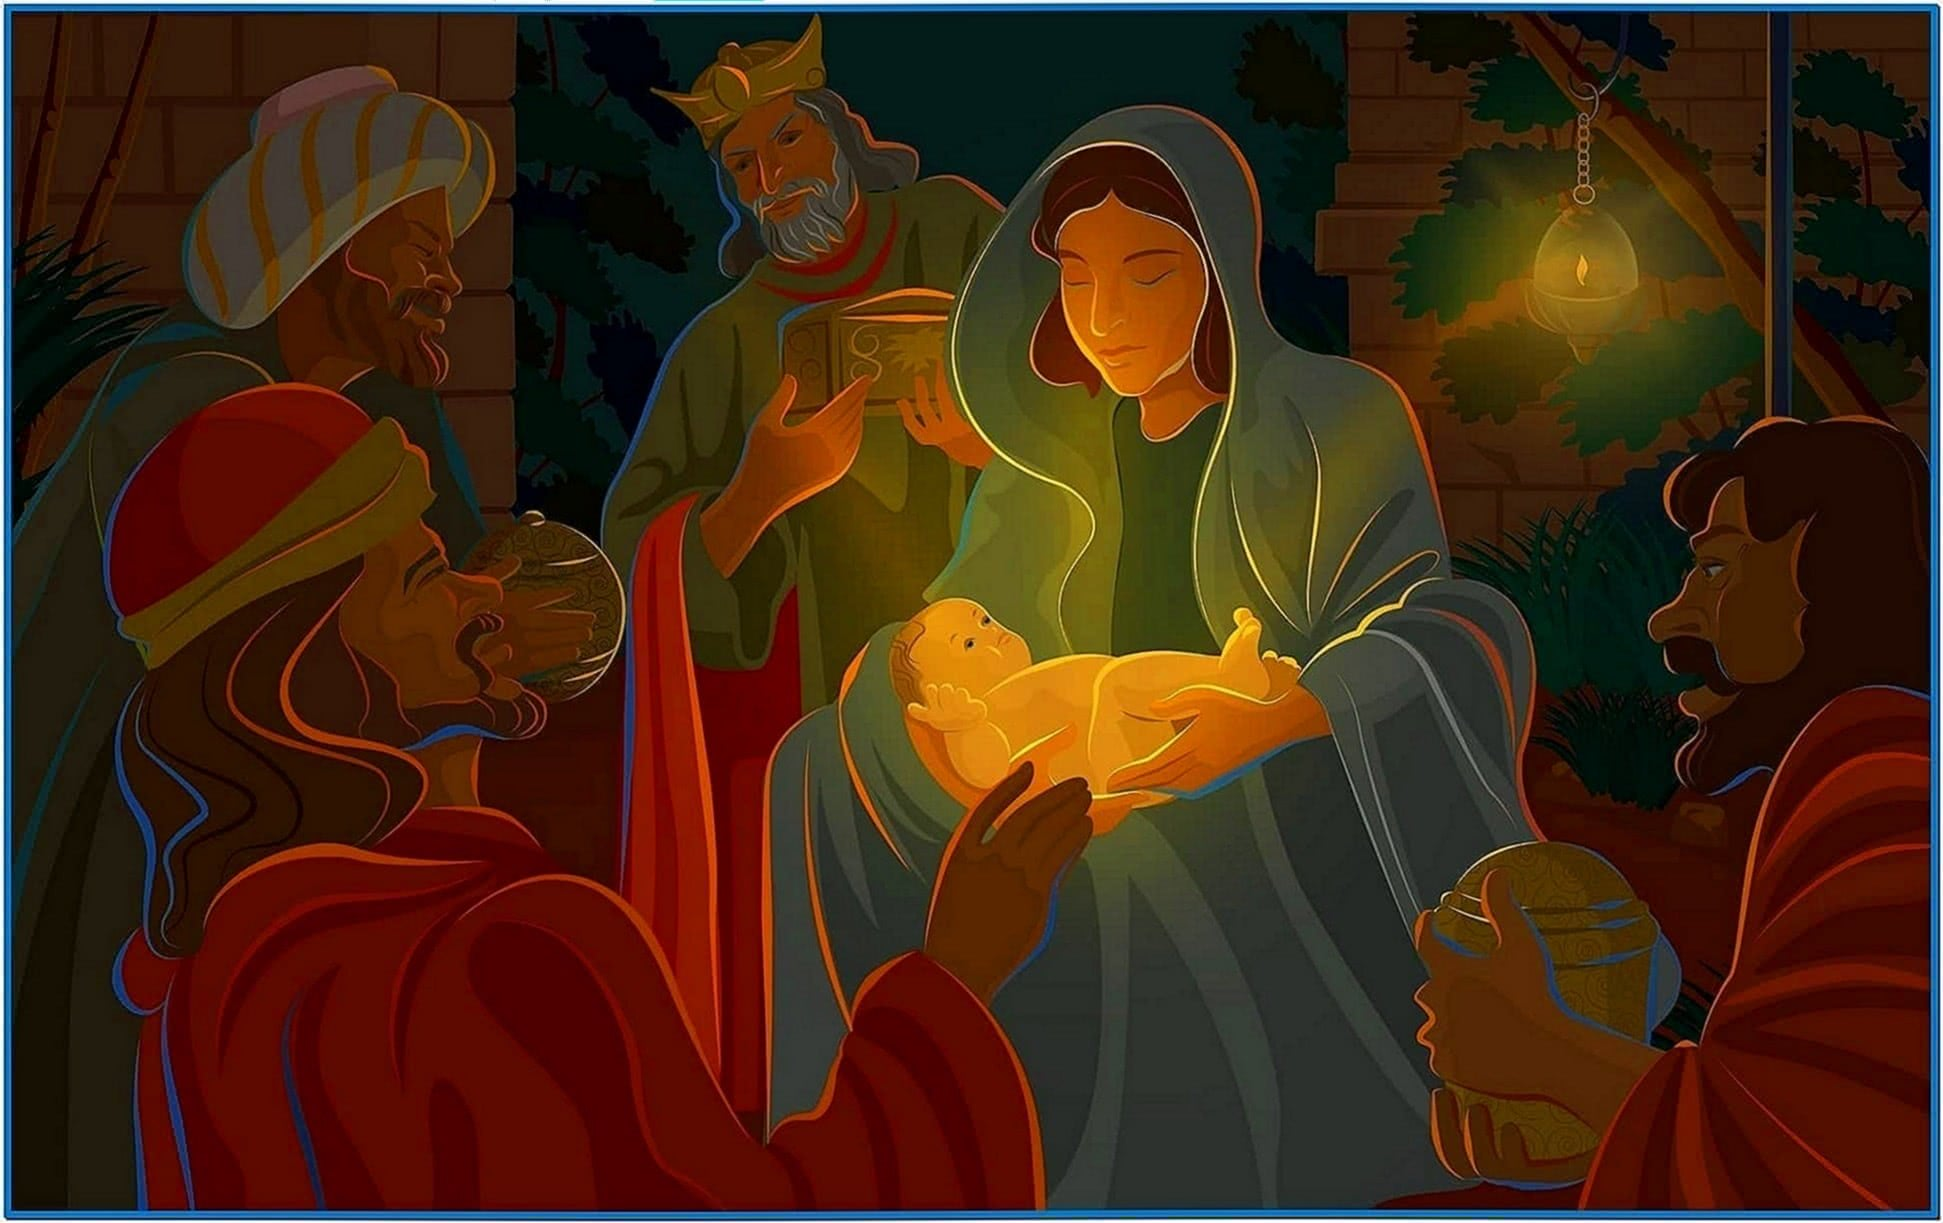 Religious Christmas Wallpaper Screensavers